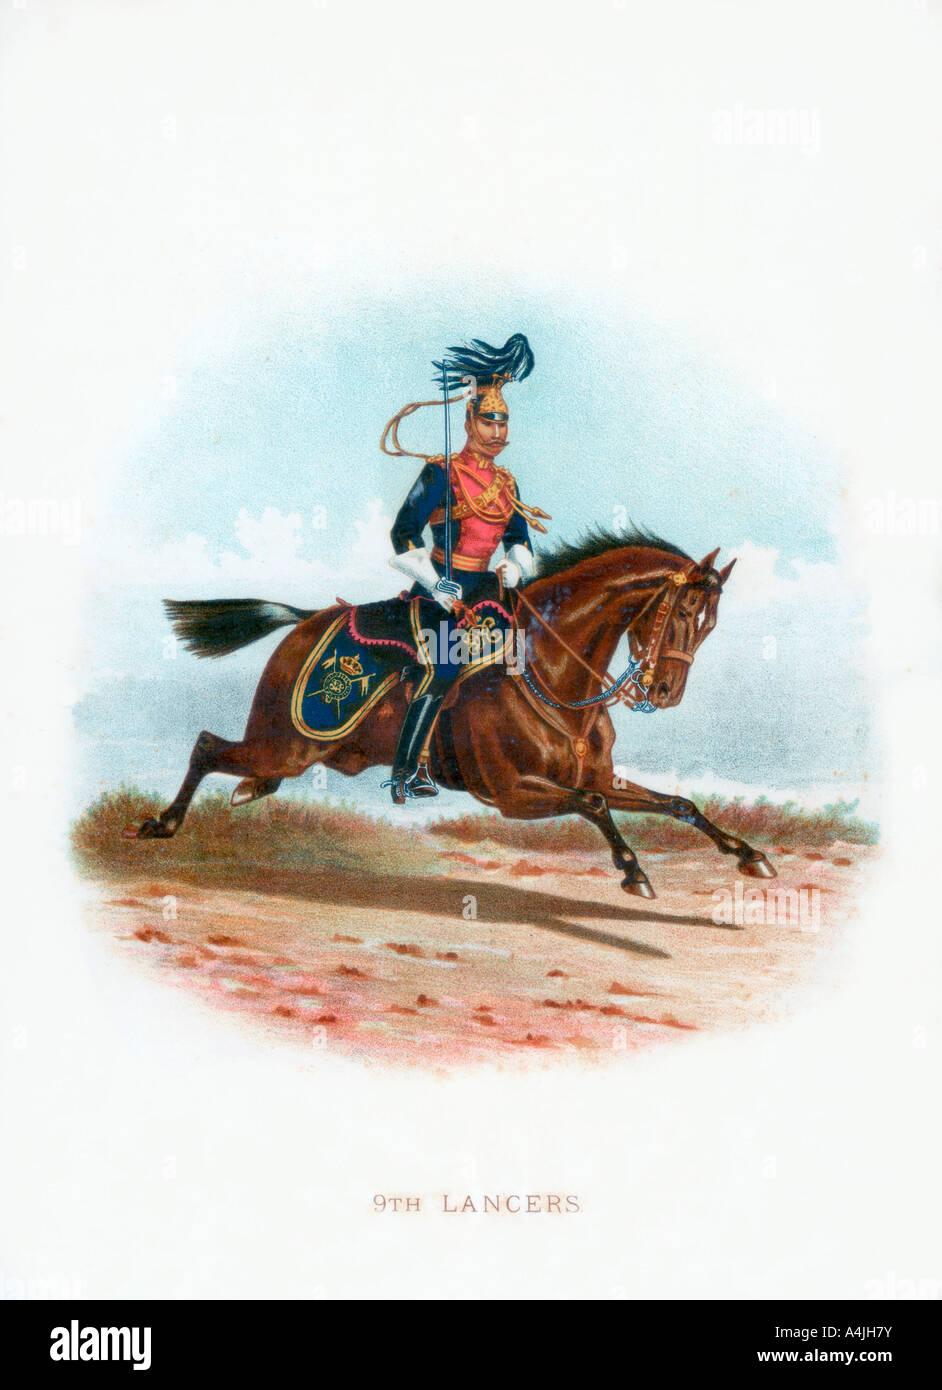 9th Lancers 1889  - Stock Image